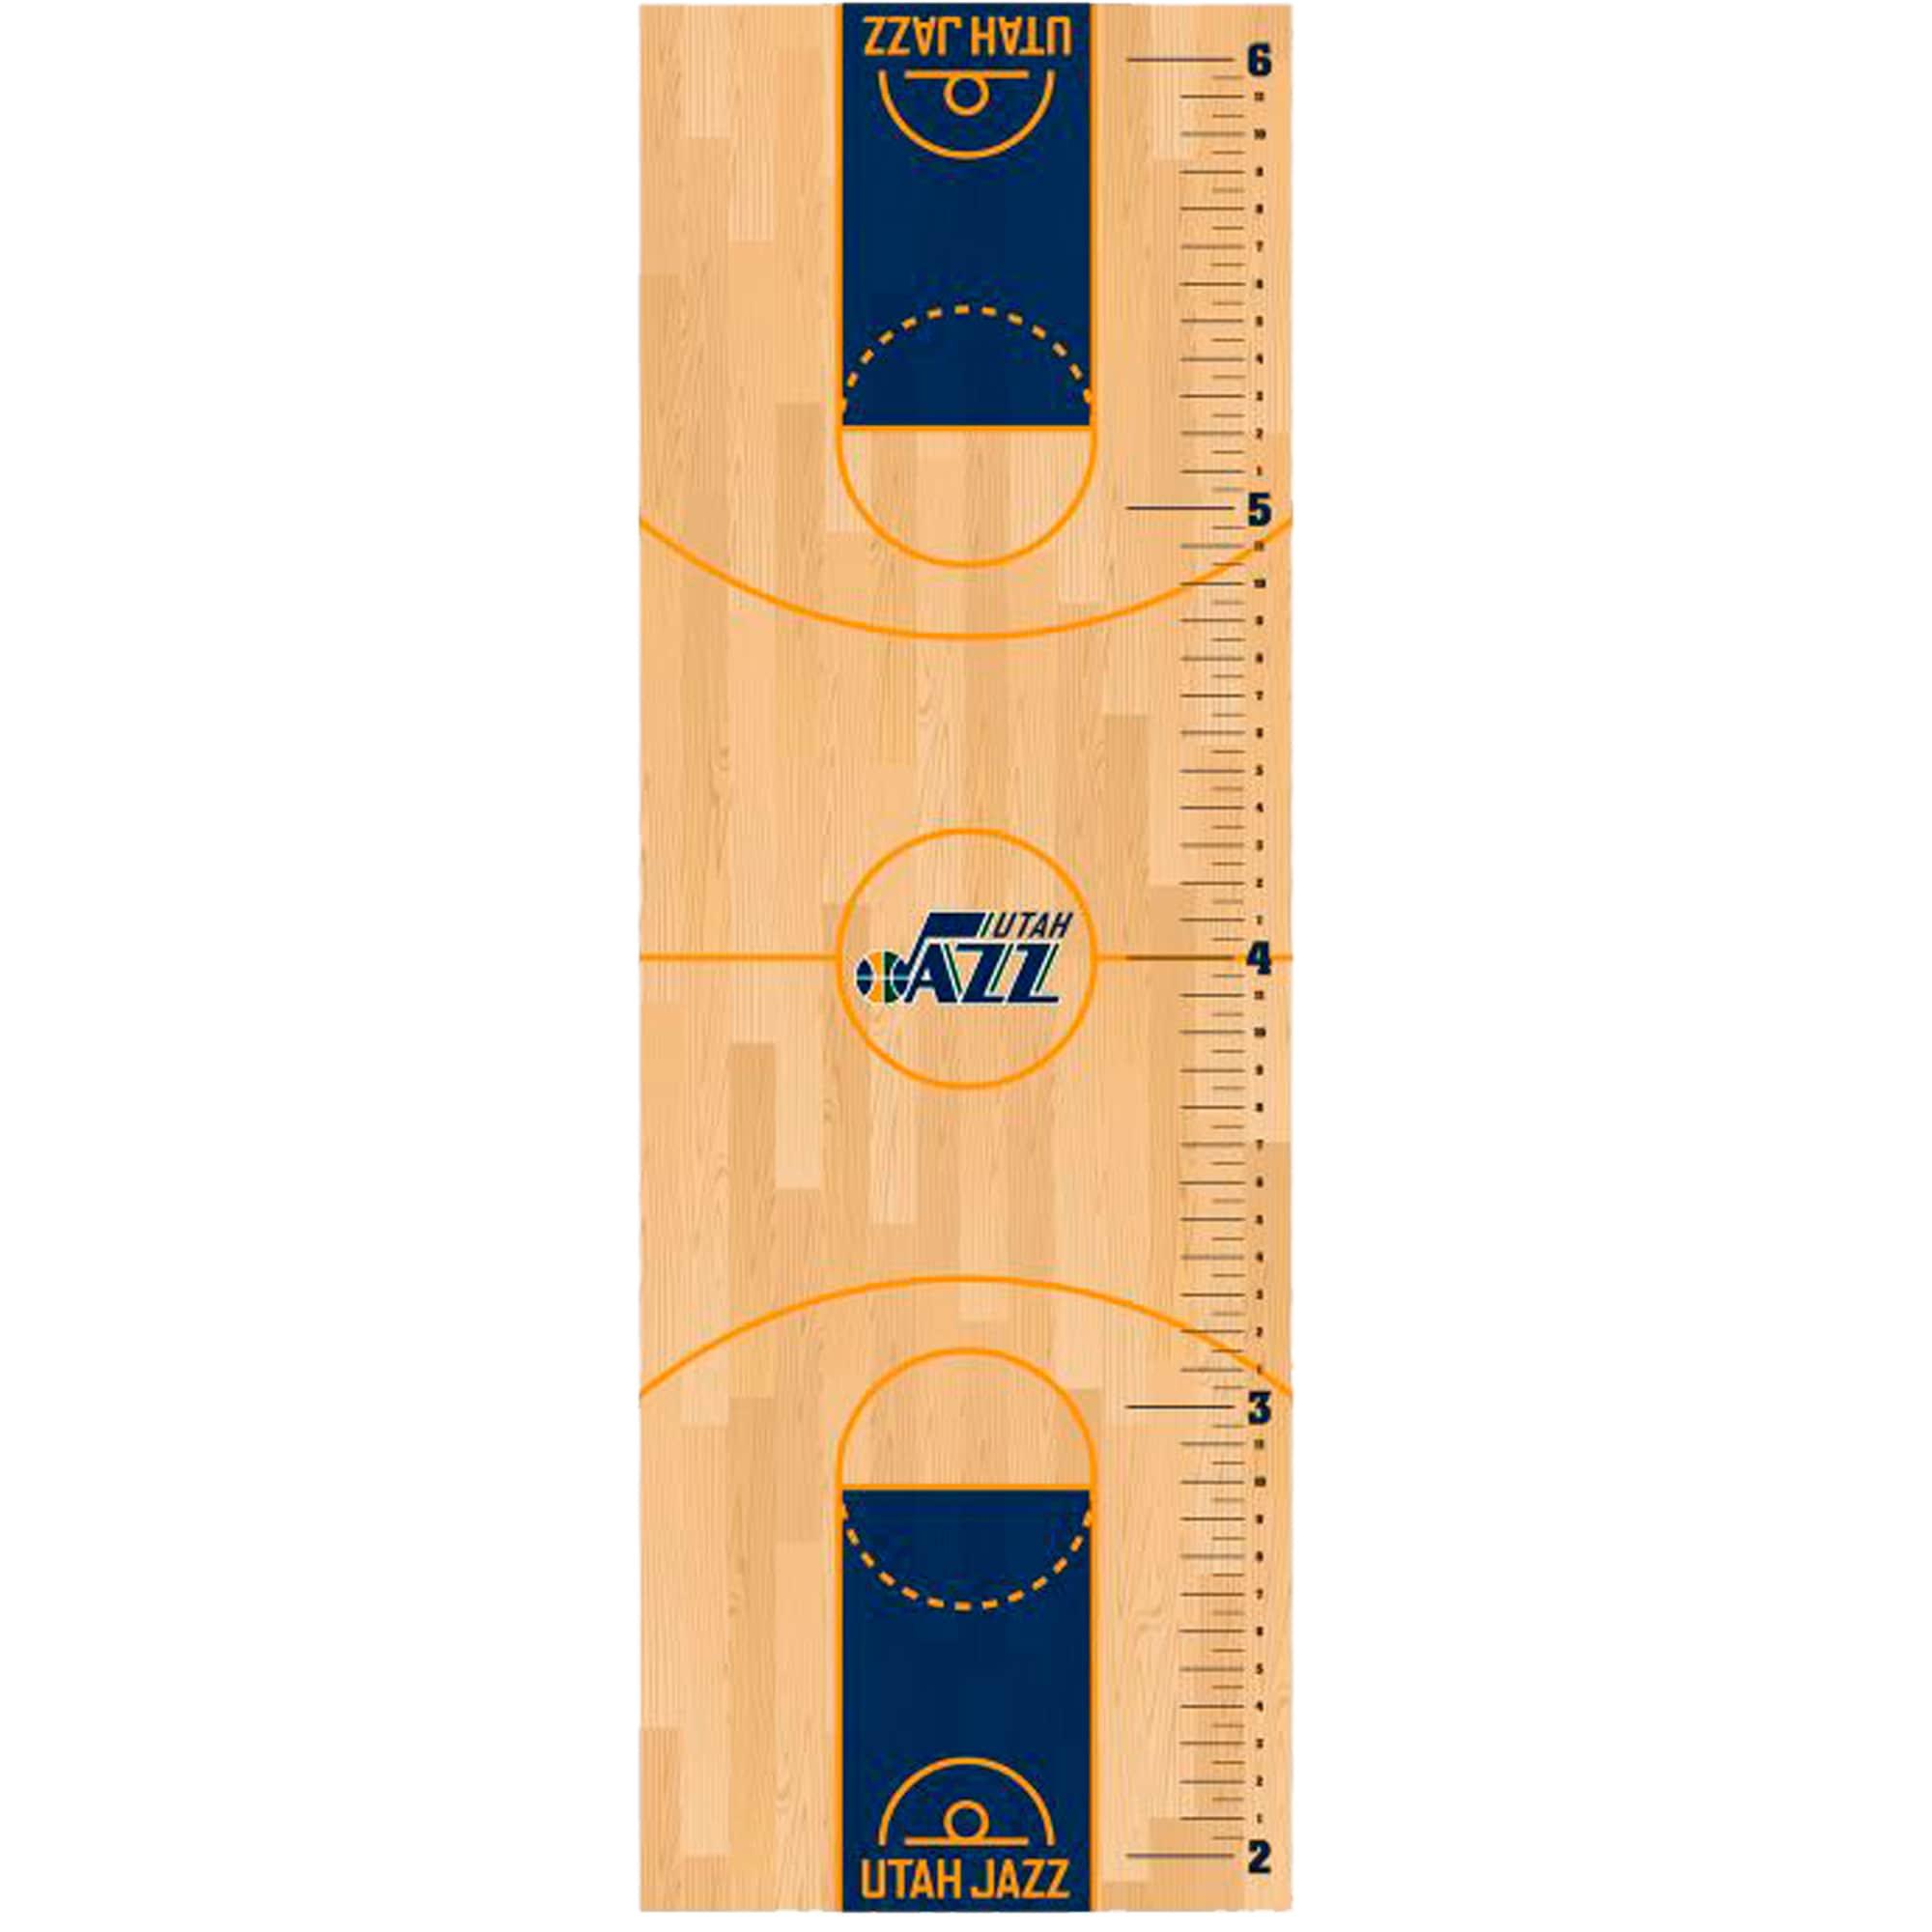 Utah Jazz Fathead Basketball Court Large Removable Growth Chart